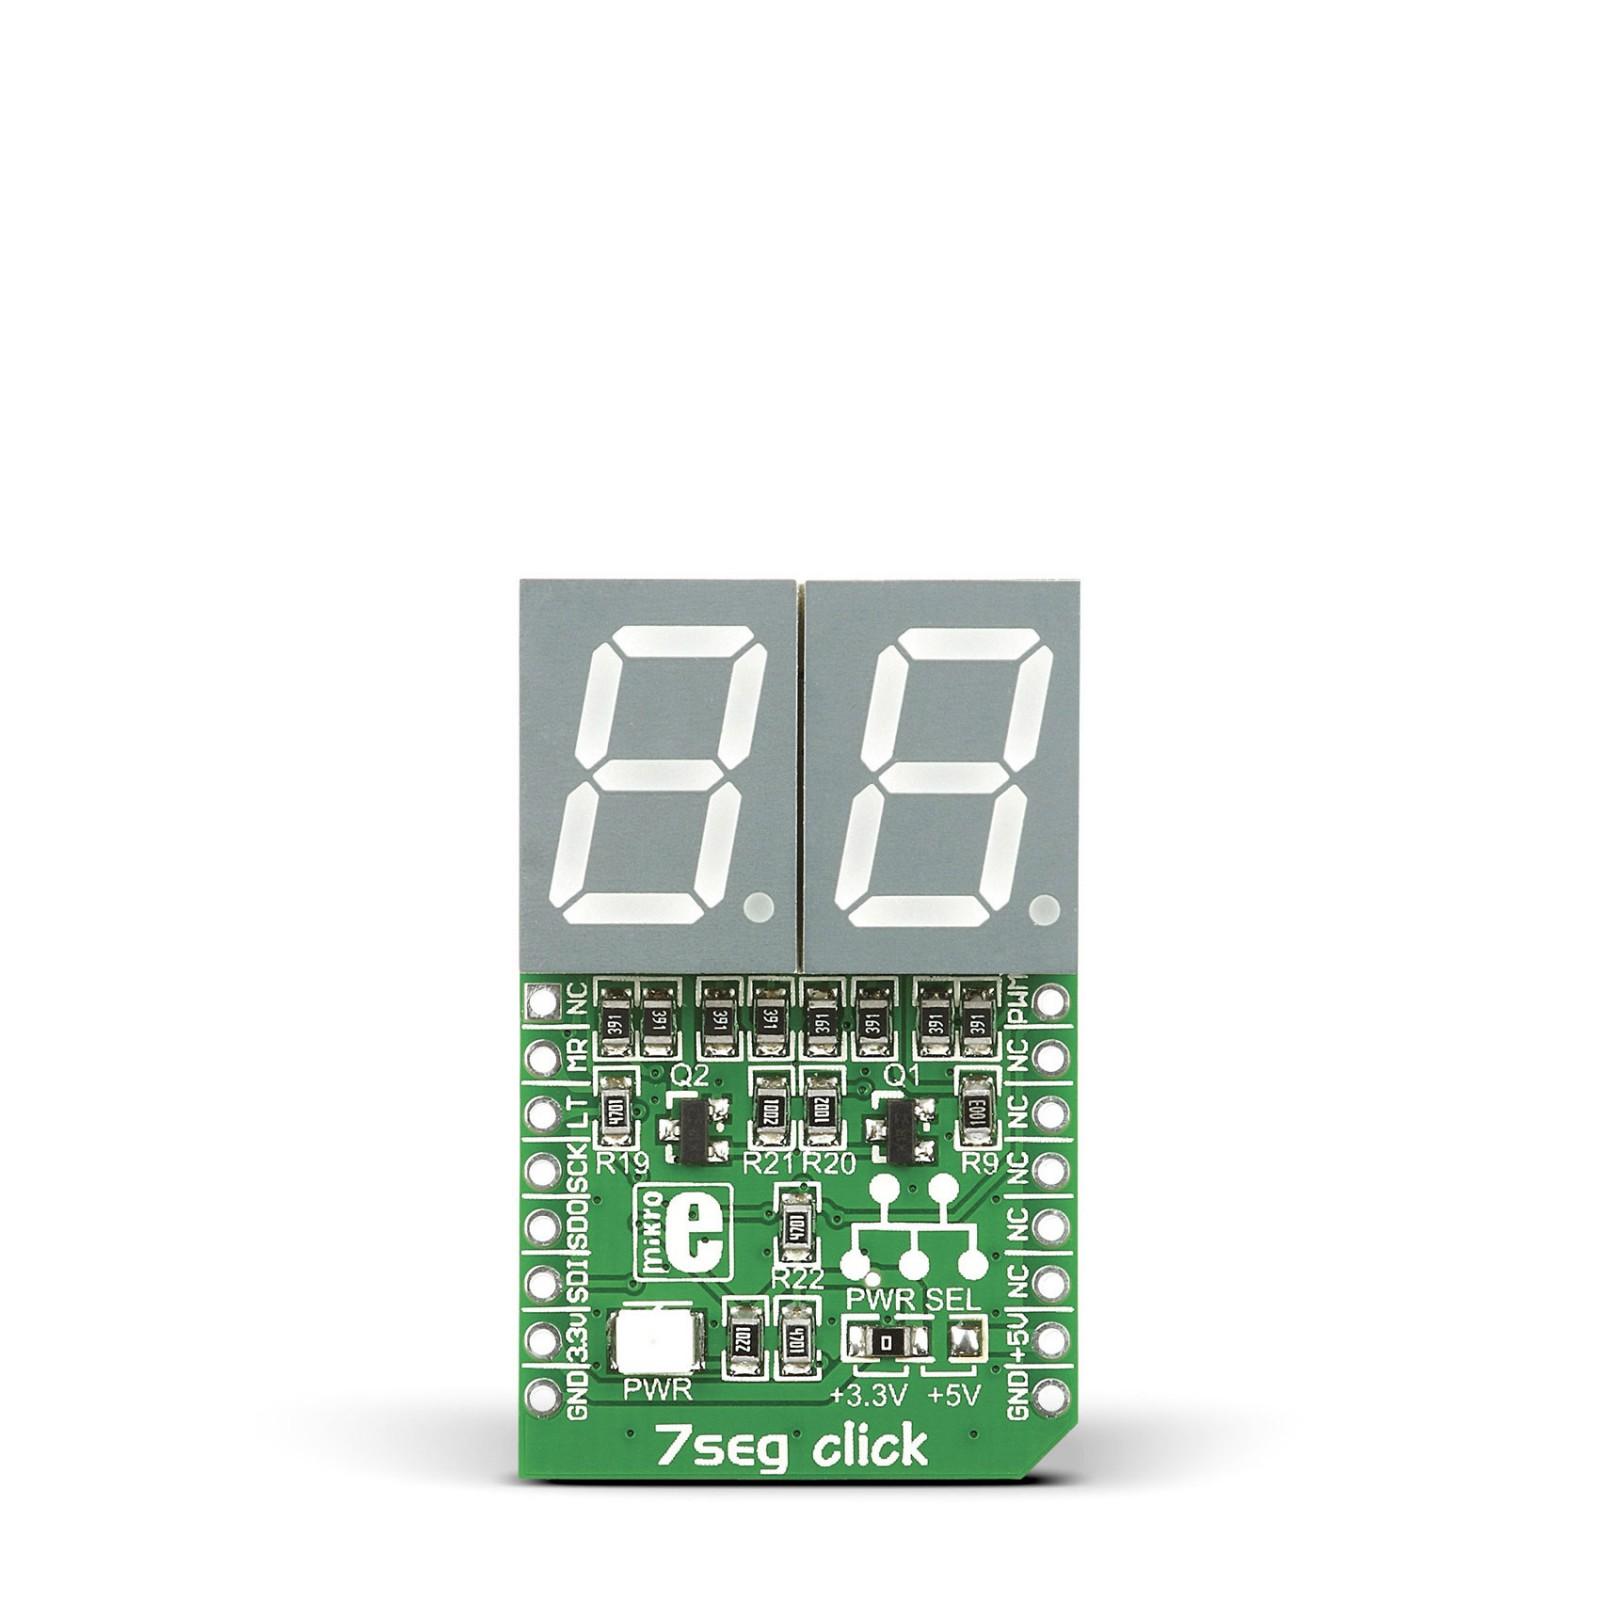 7seg Click Serial 7 Segment Display Board Here Is The Schematic For 2digit 7segment Circuit Mgctlbxnmzp Mgctlbxv5112 Mgctlbxlc Mgctlbxpprestashop